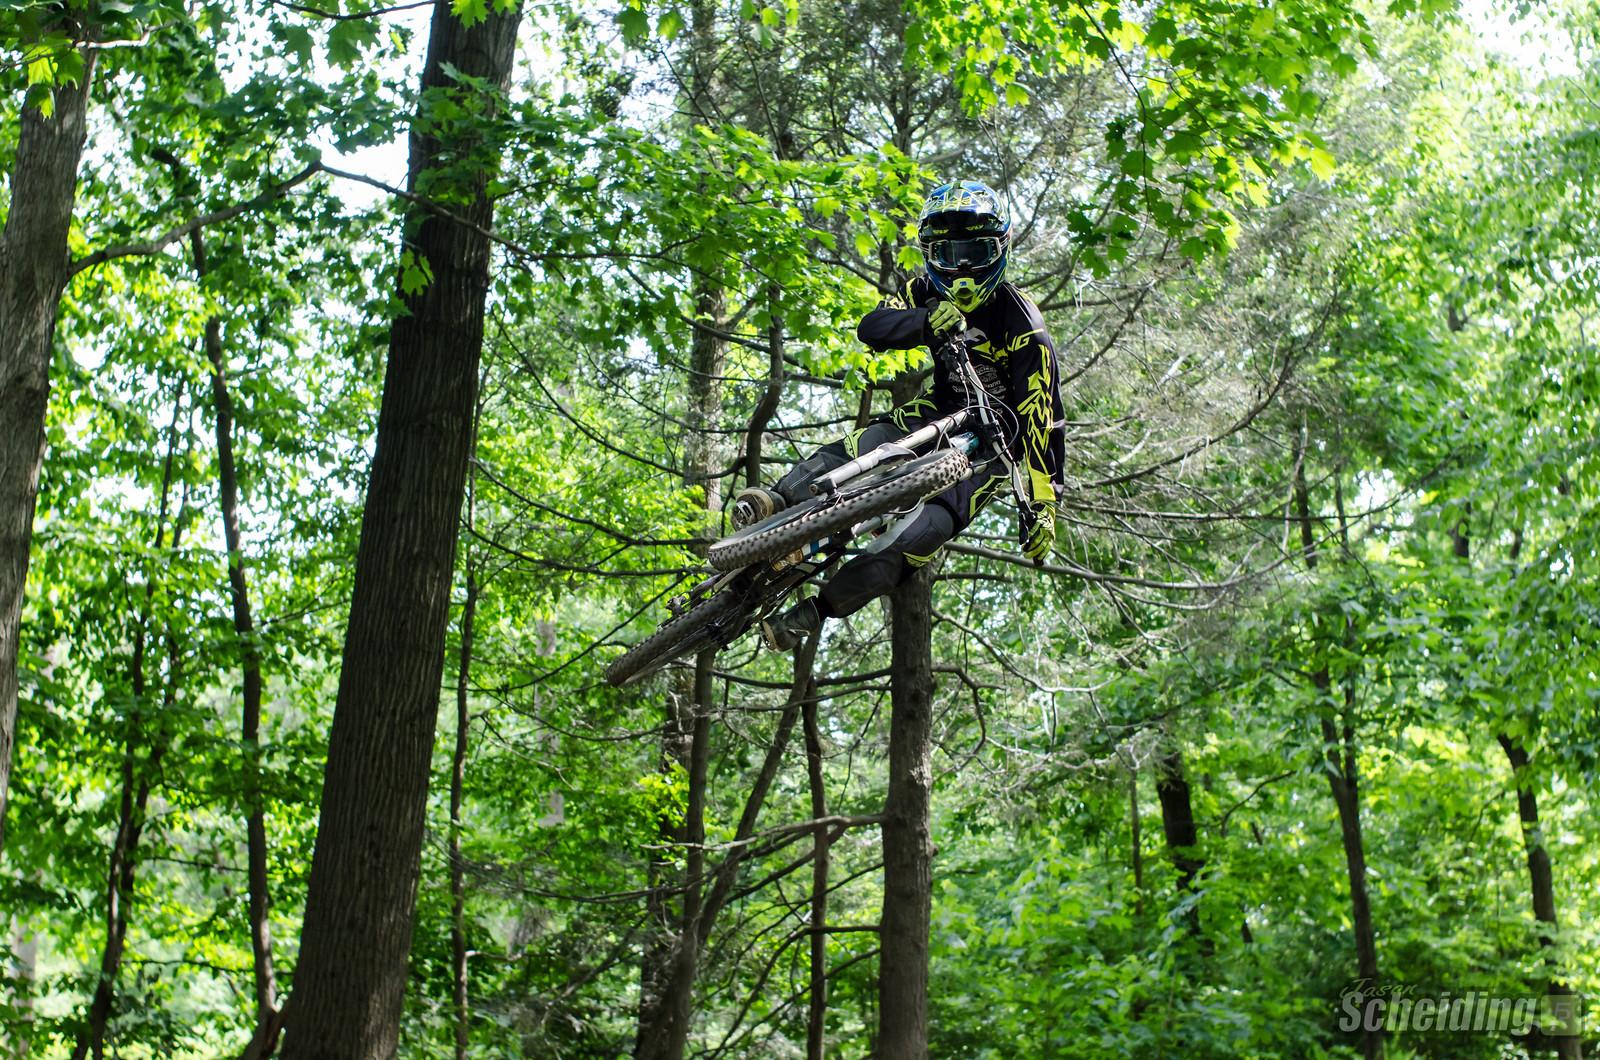 DSC 9266 - JasonScheiding - Mountain Biking Pictures - Vital MTB